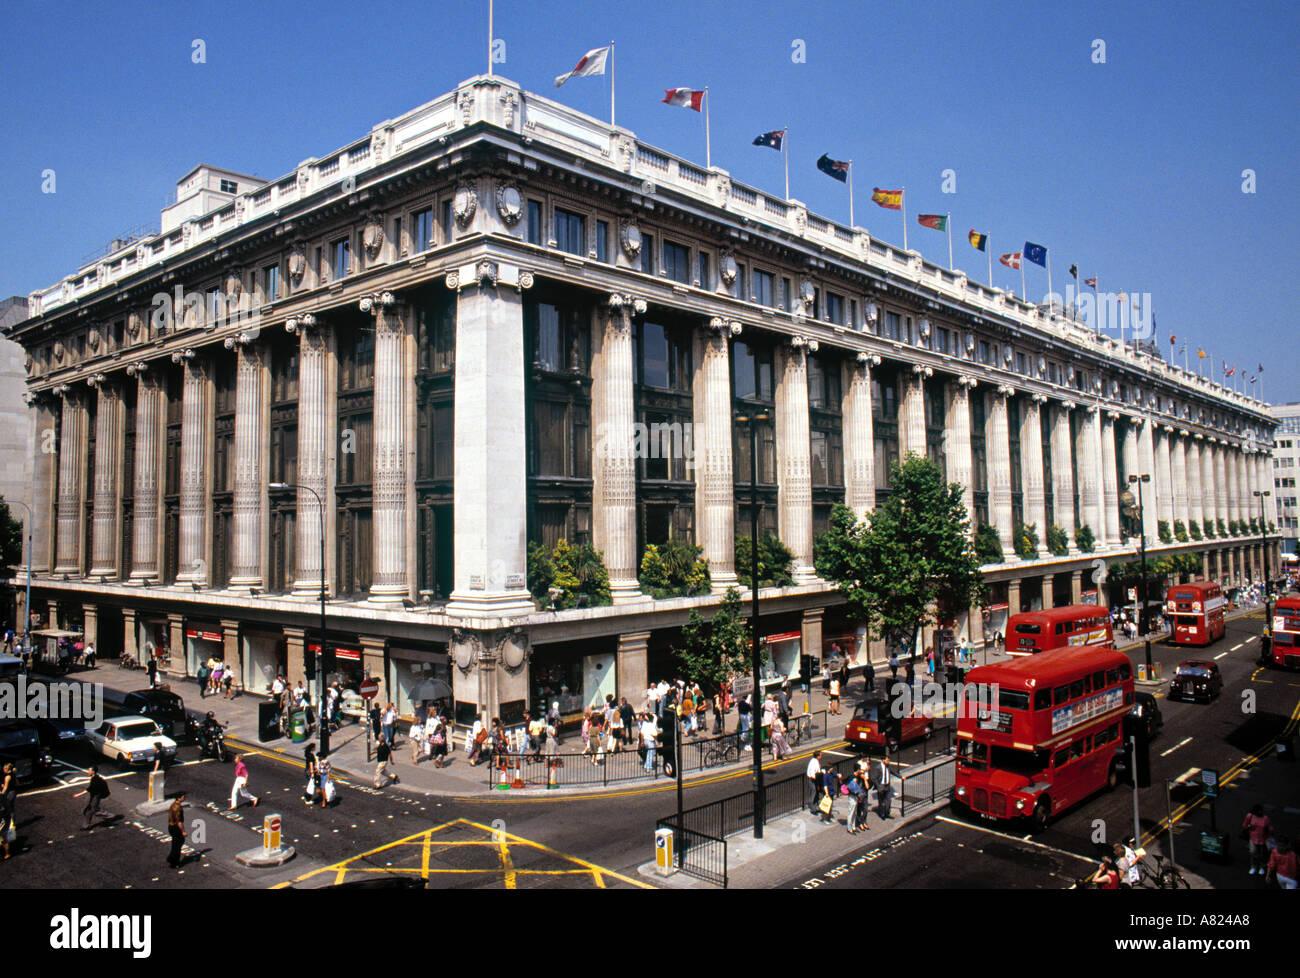 Selfridges, Oxford Street, London, England - Stock Image